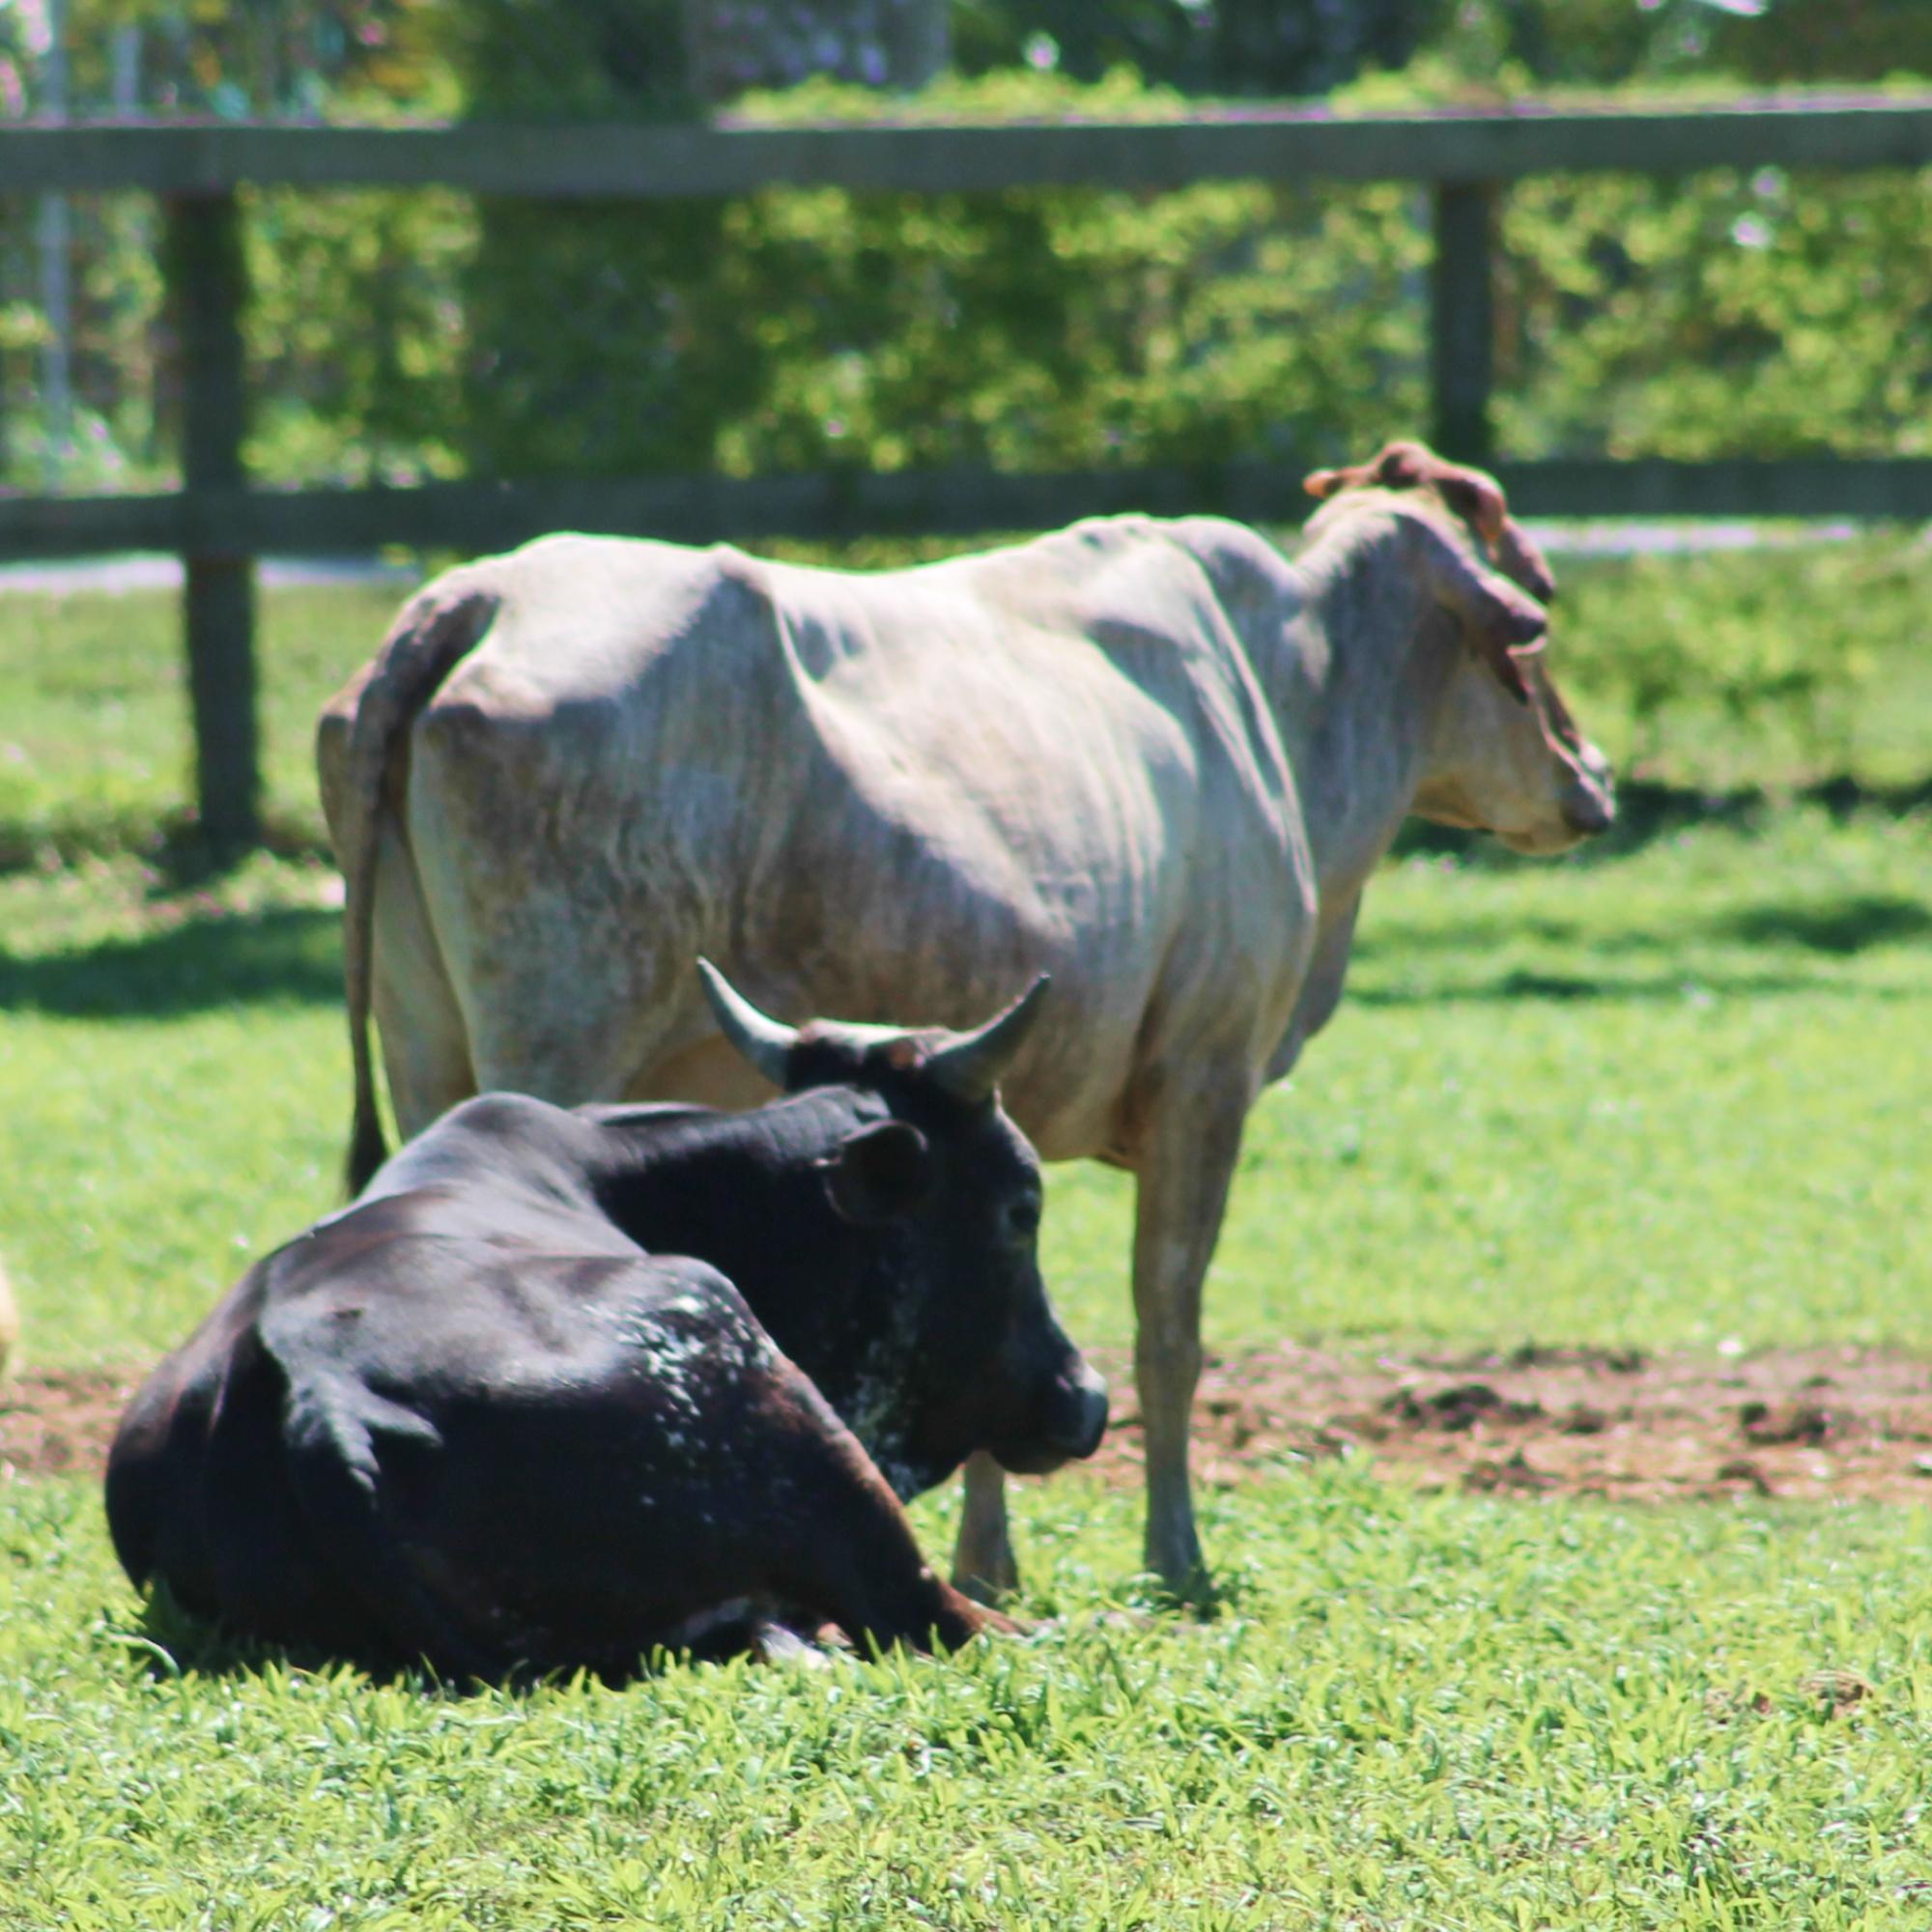 South Florida SPCA rescues livestock cows